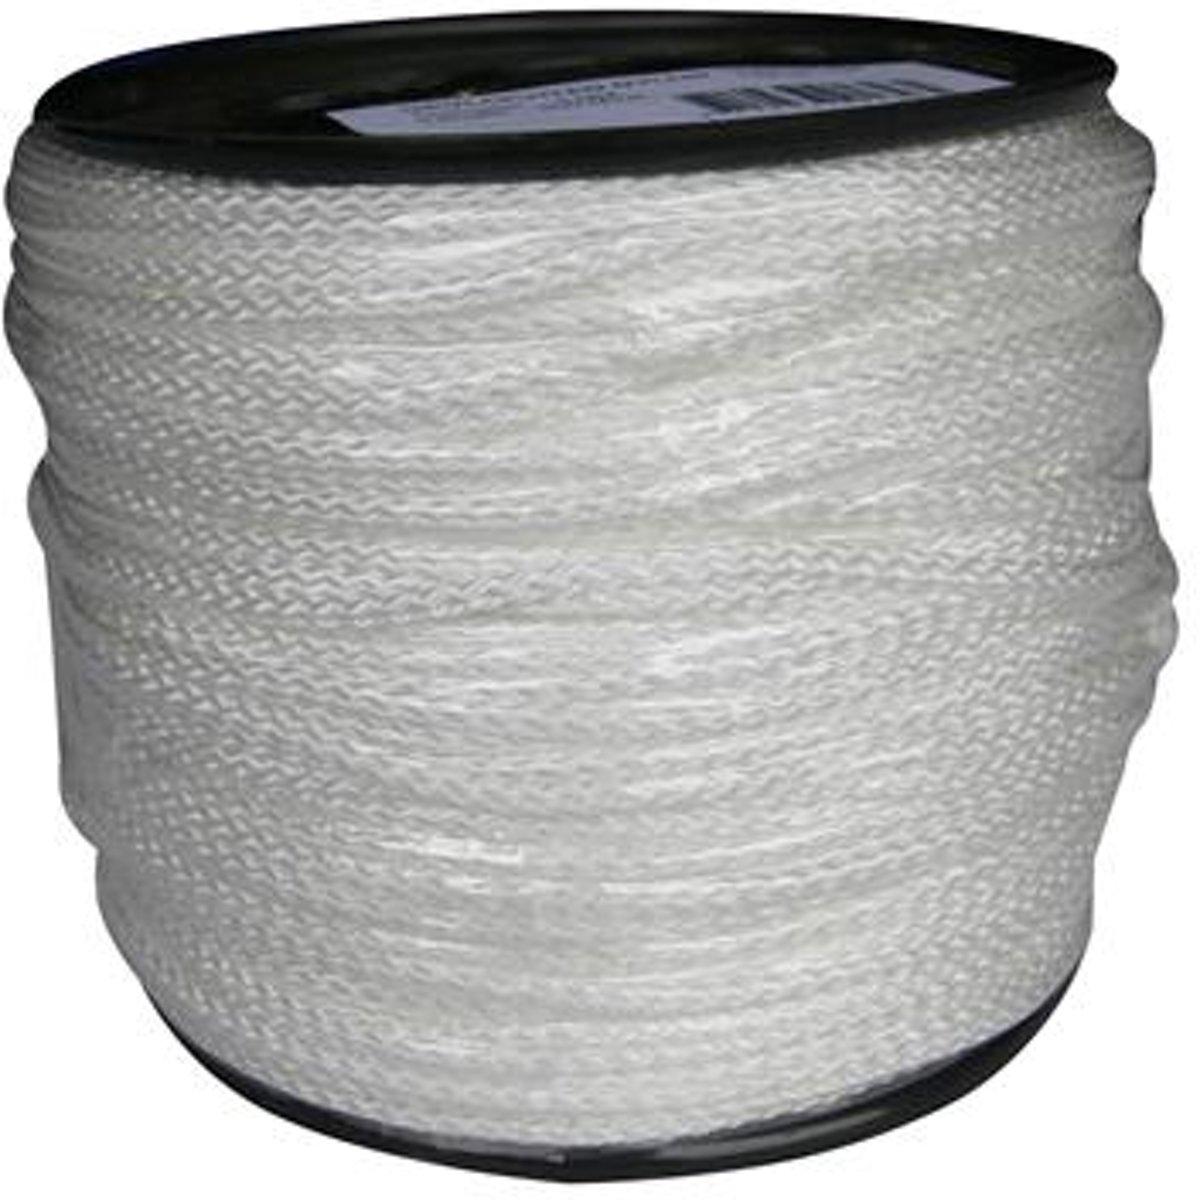 Erro Storage Nylon touw 3mm - 200m 7918484 kopen